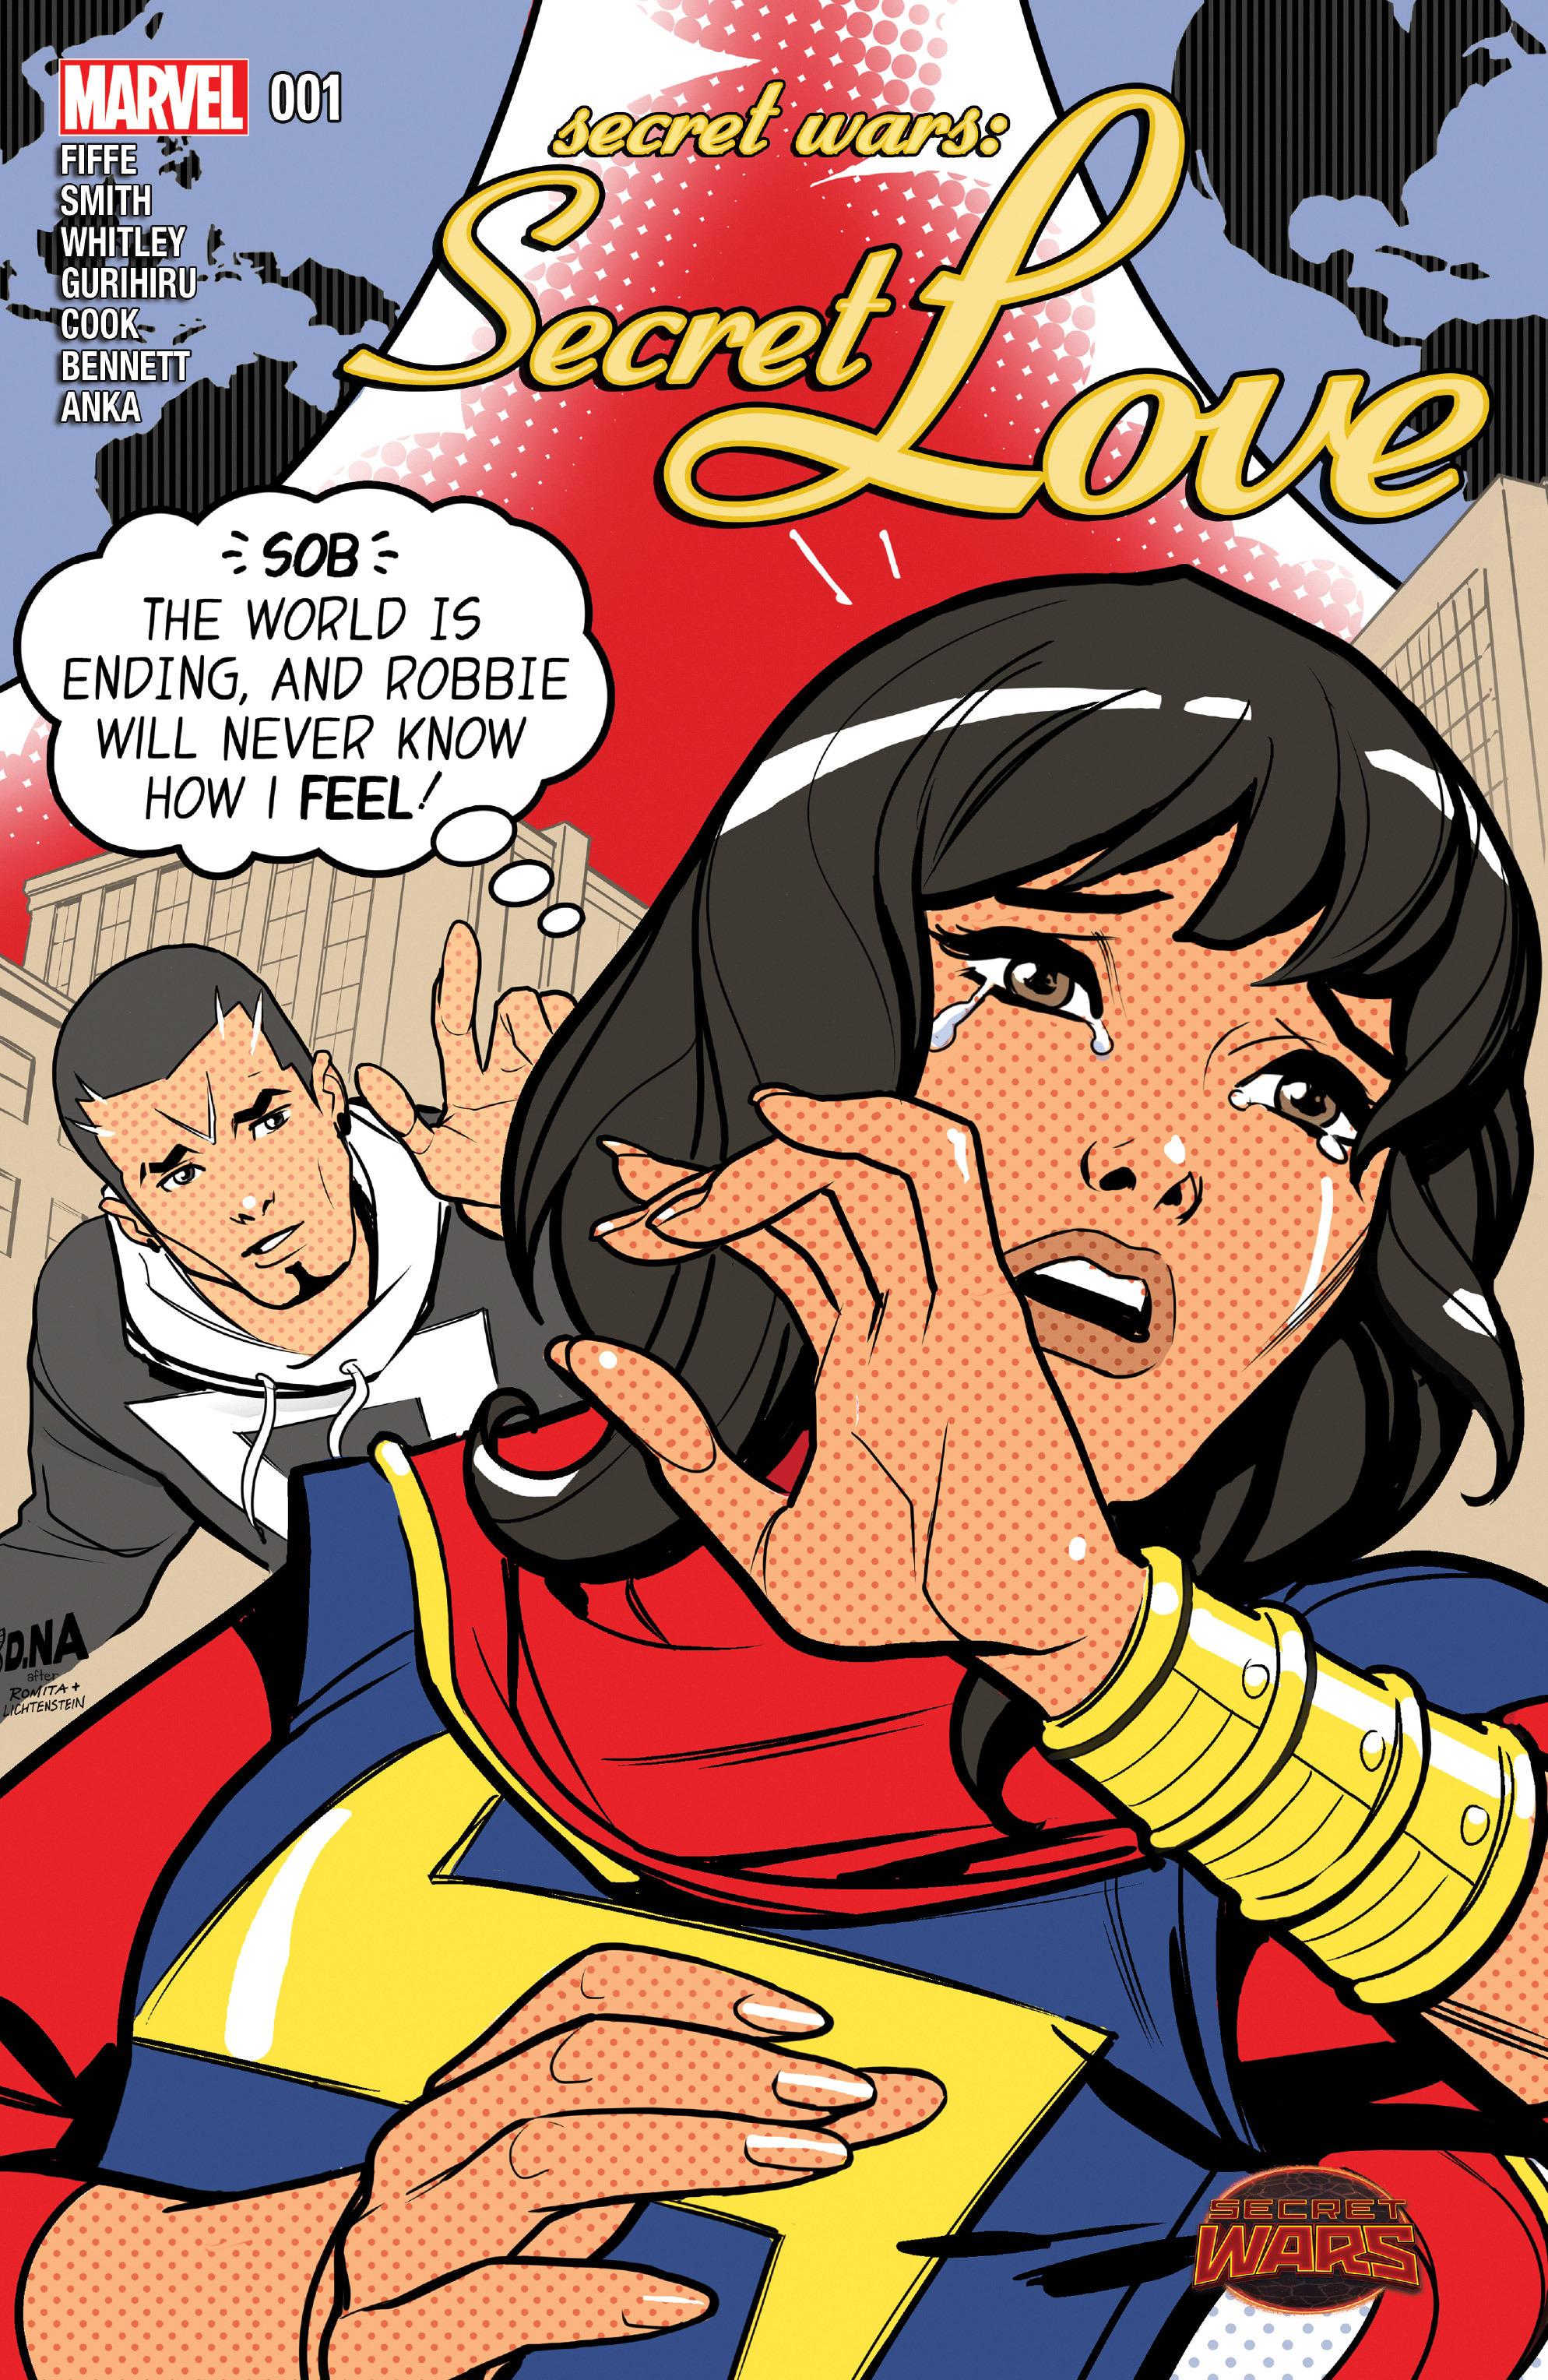 Read online Secret Wars: Secret Love comic -  Issue # Full - 1